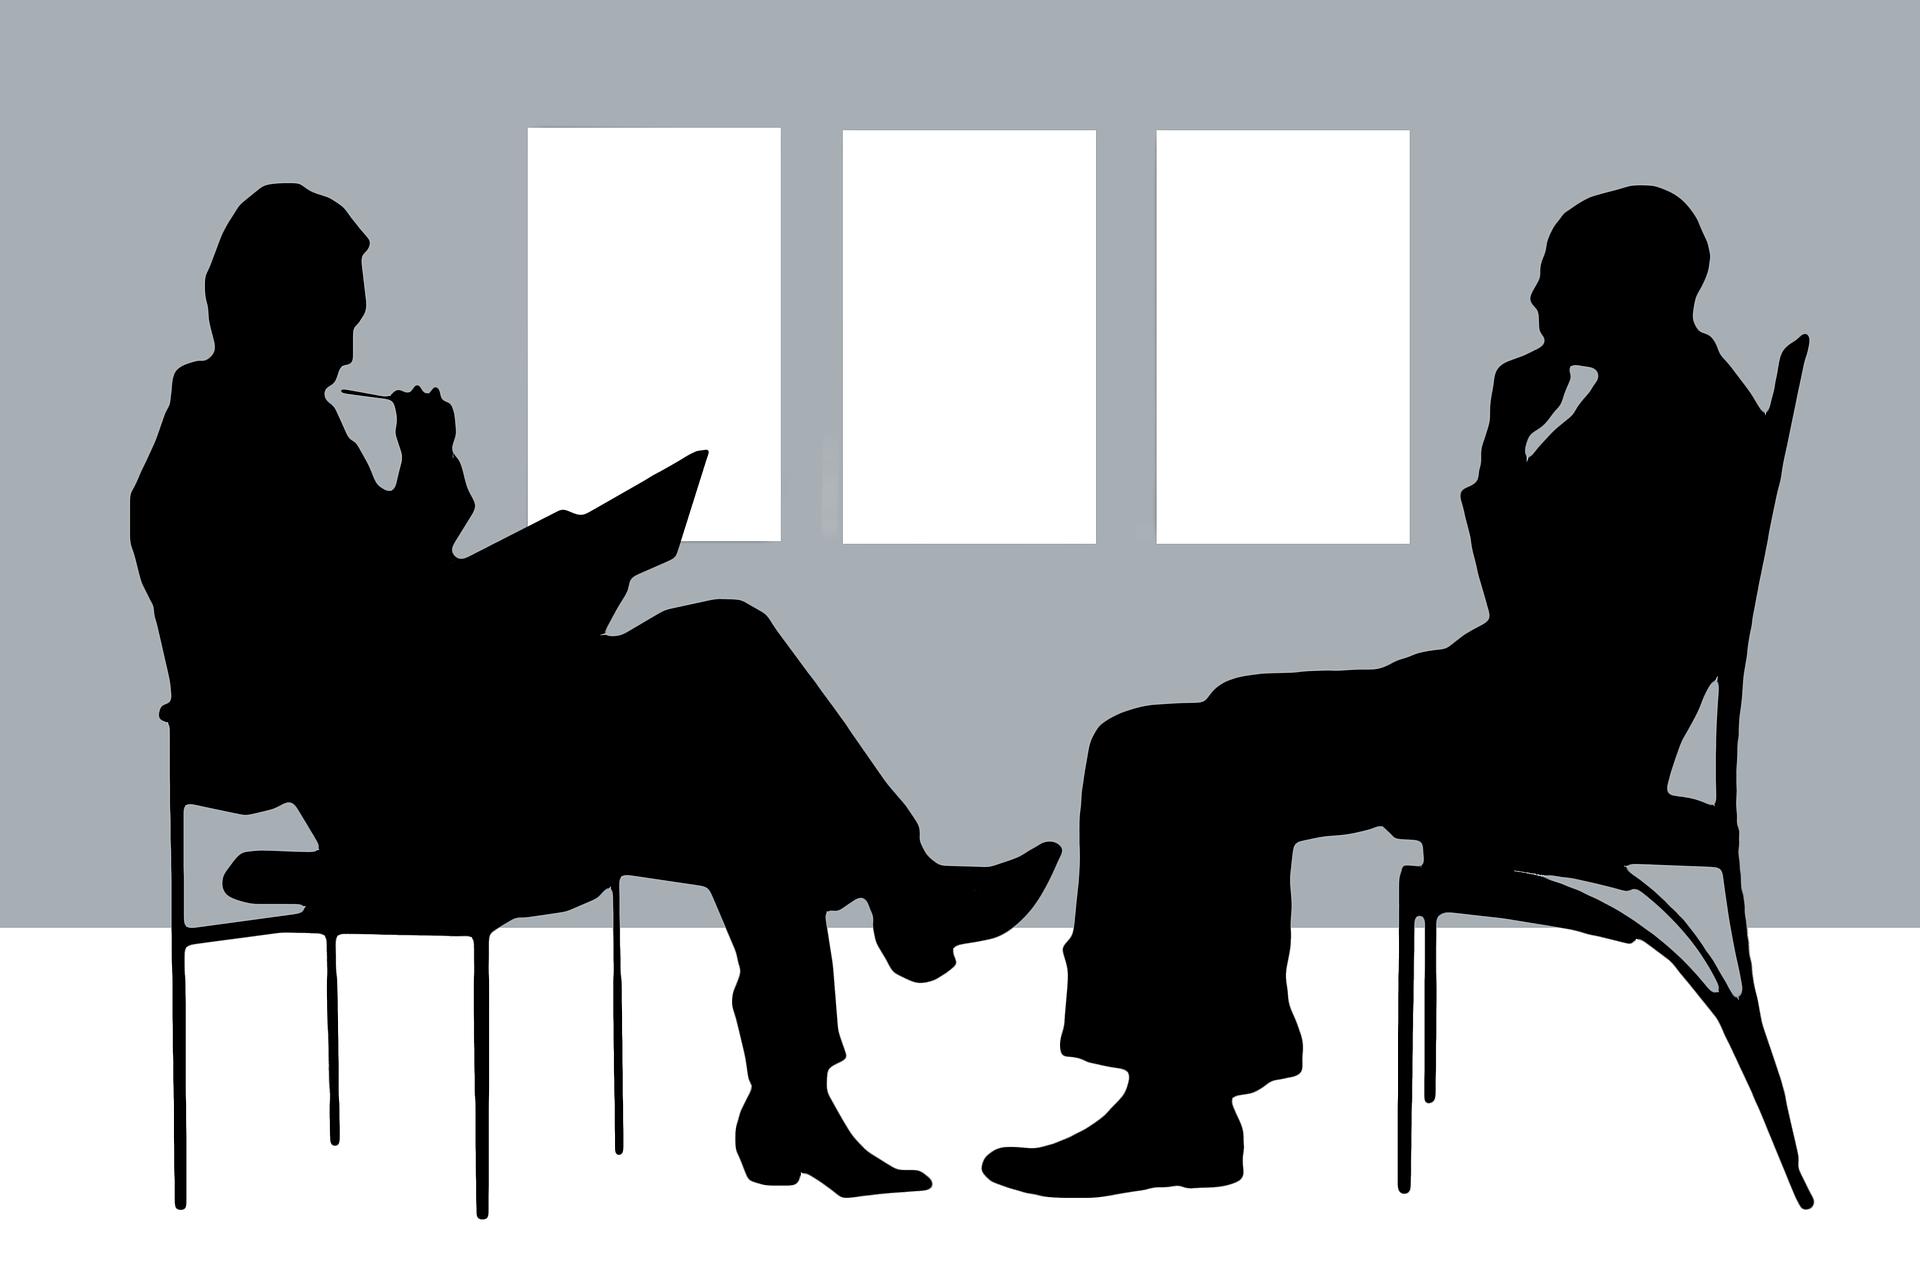 two people talking and debating.